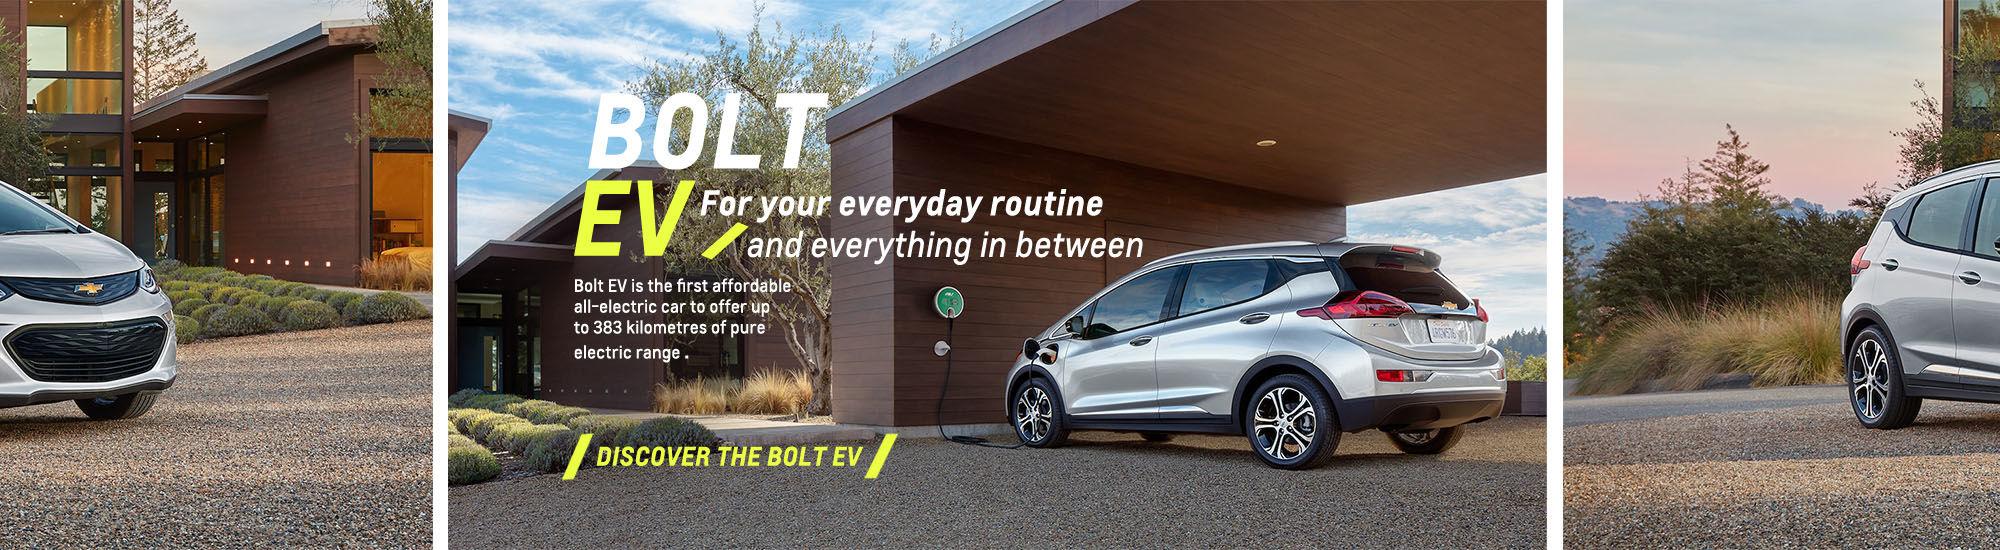 2019 Bolt-EV Chevrolet